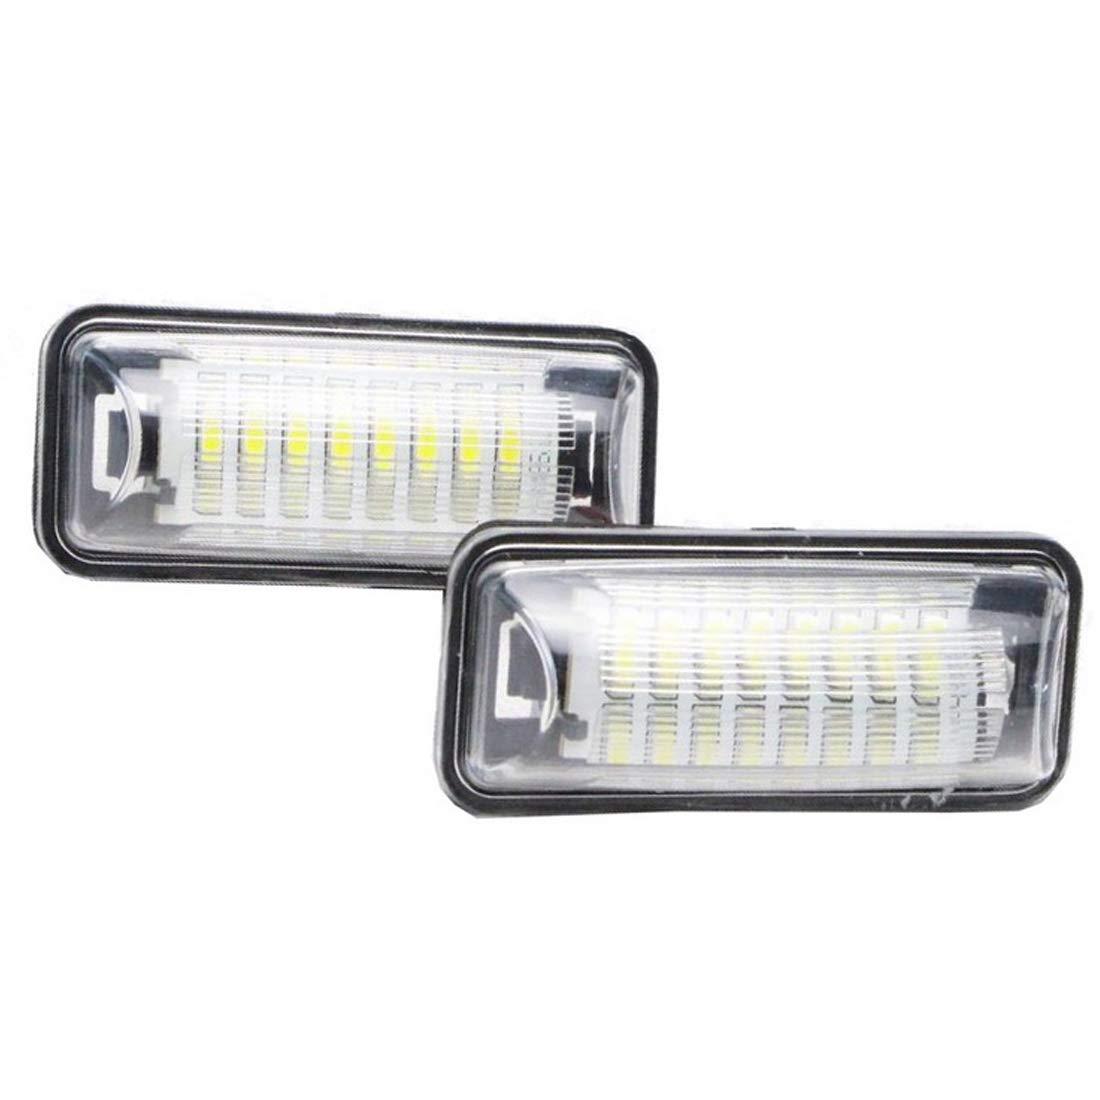 18 LED Canbus 12V Error Free White Lamp VIGORFLYRUN PARTS LTD 2pcs Car LED License Number Plate Light For 86 GT86 FT86 BRZ Scion FR-S